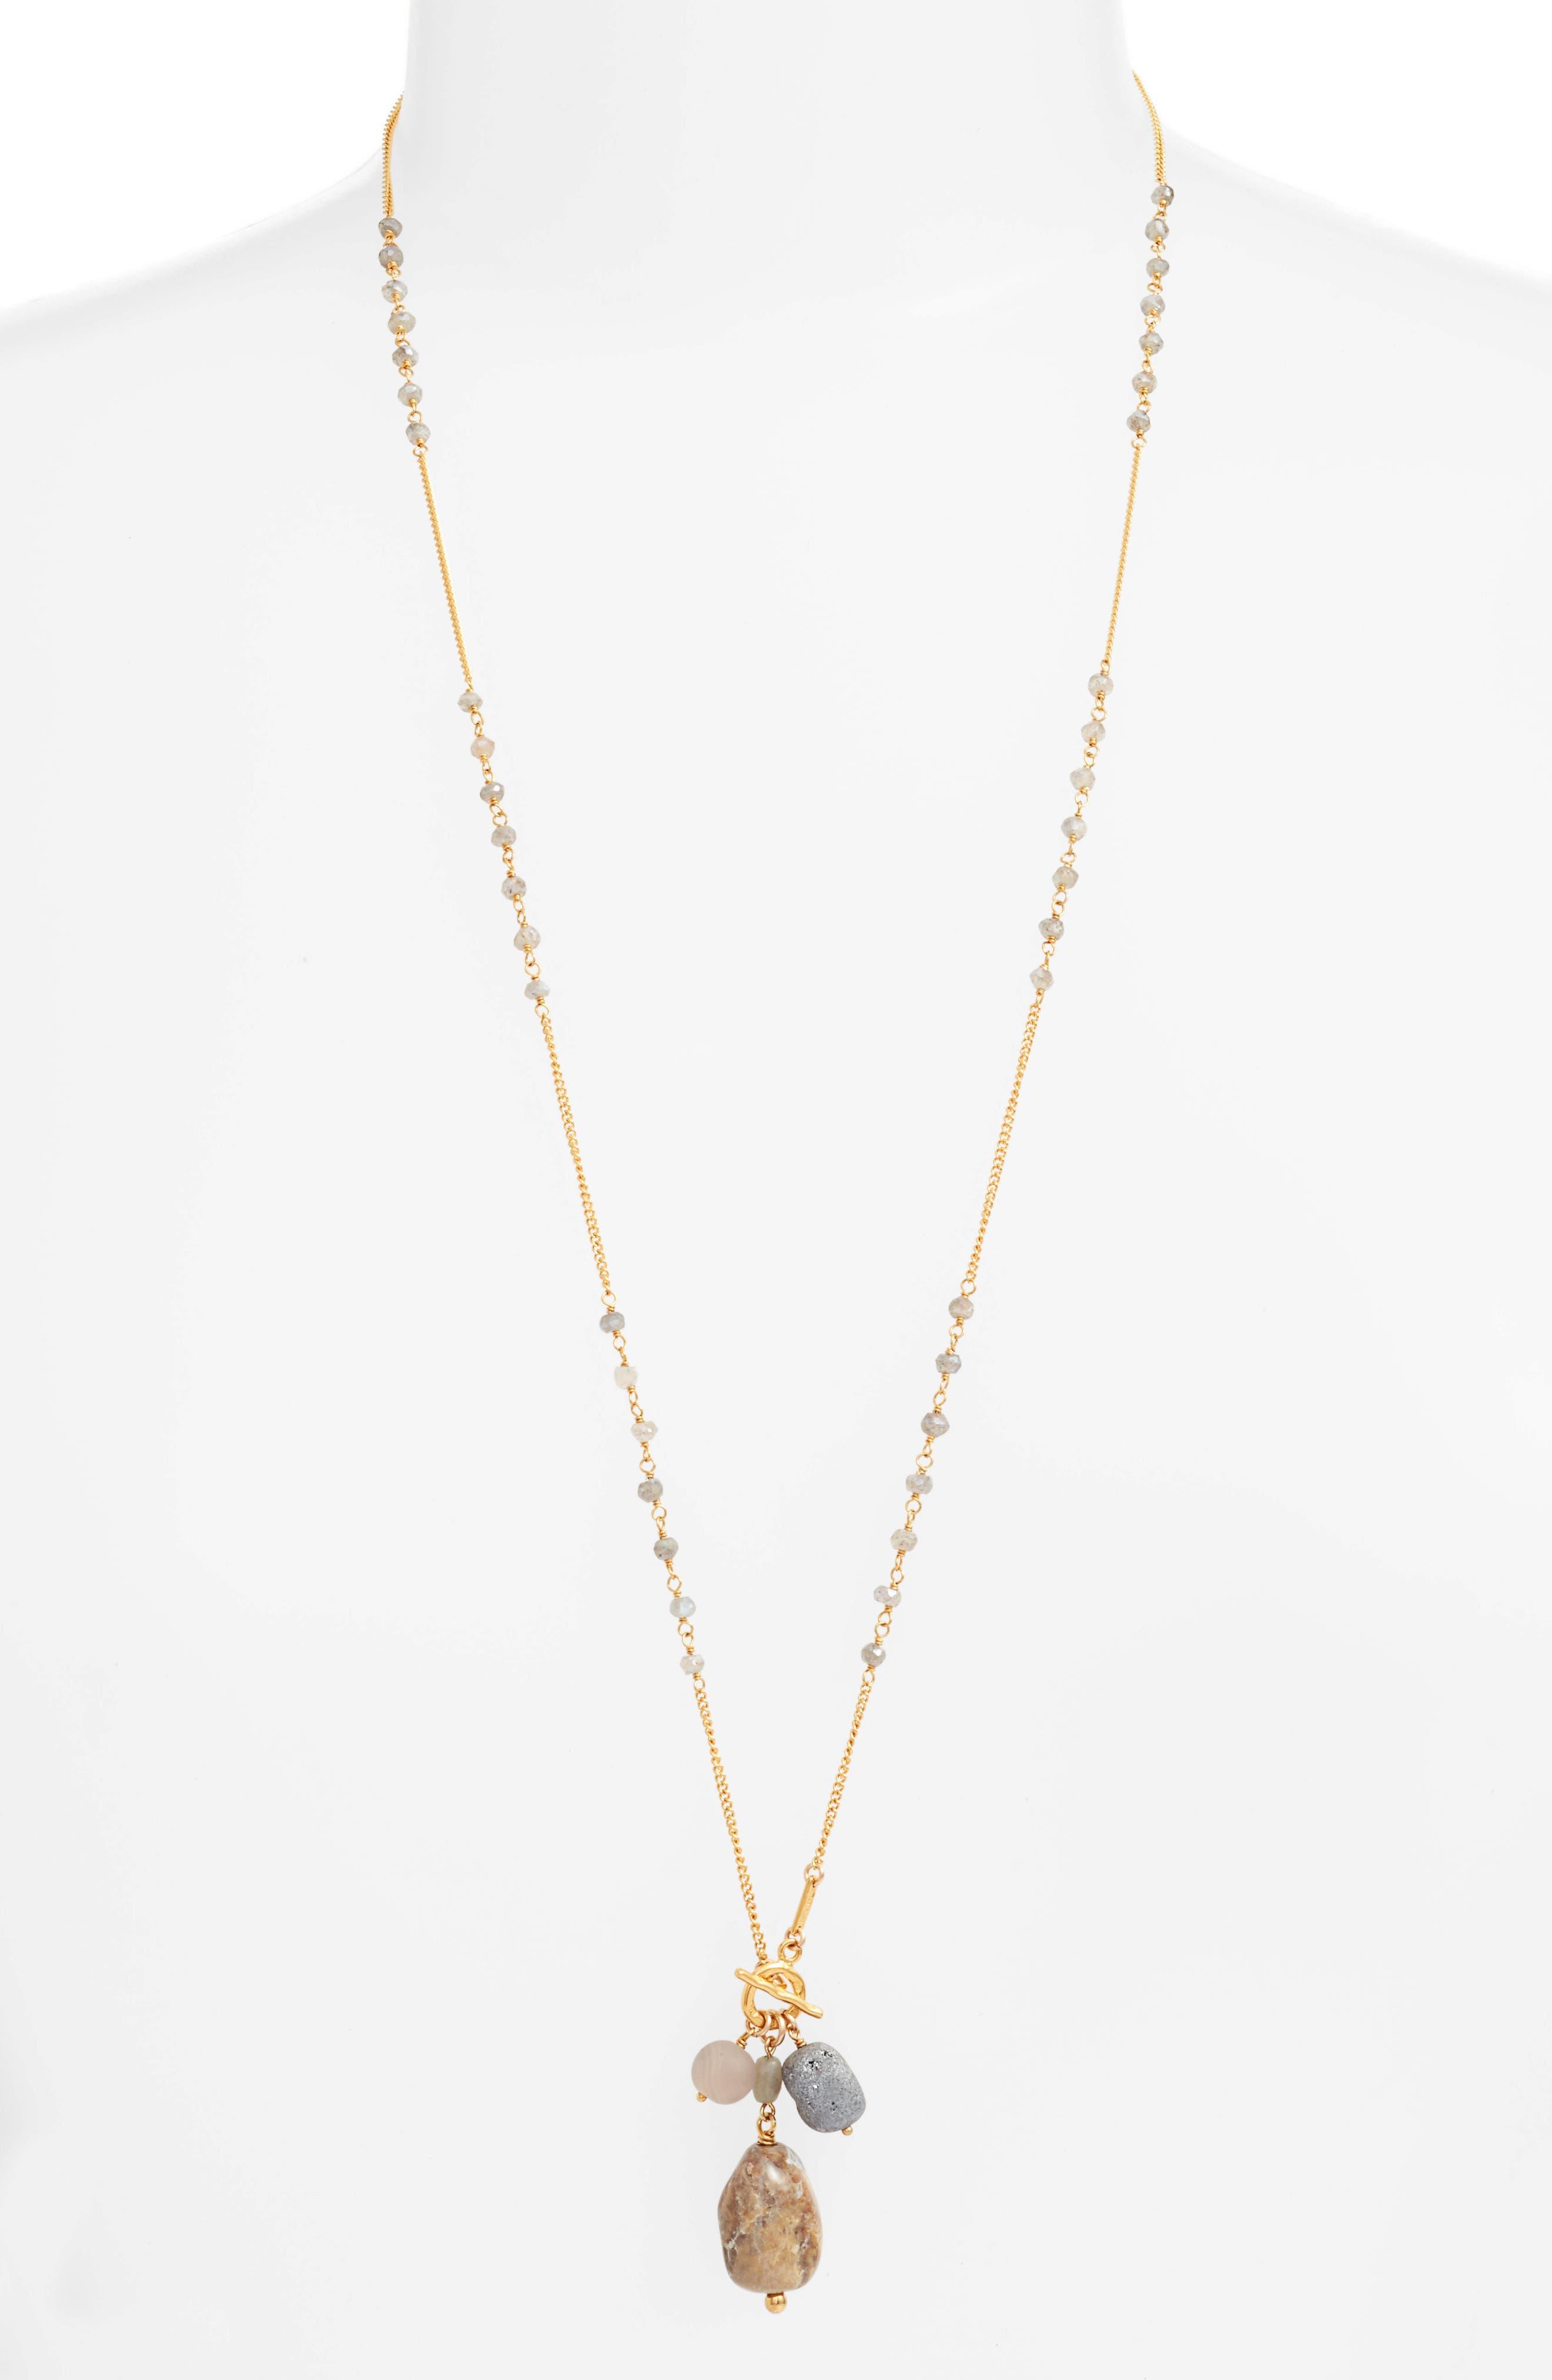 Mixed Stone Pendant Necklace,                             Main thumbnail 1, color,                             020